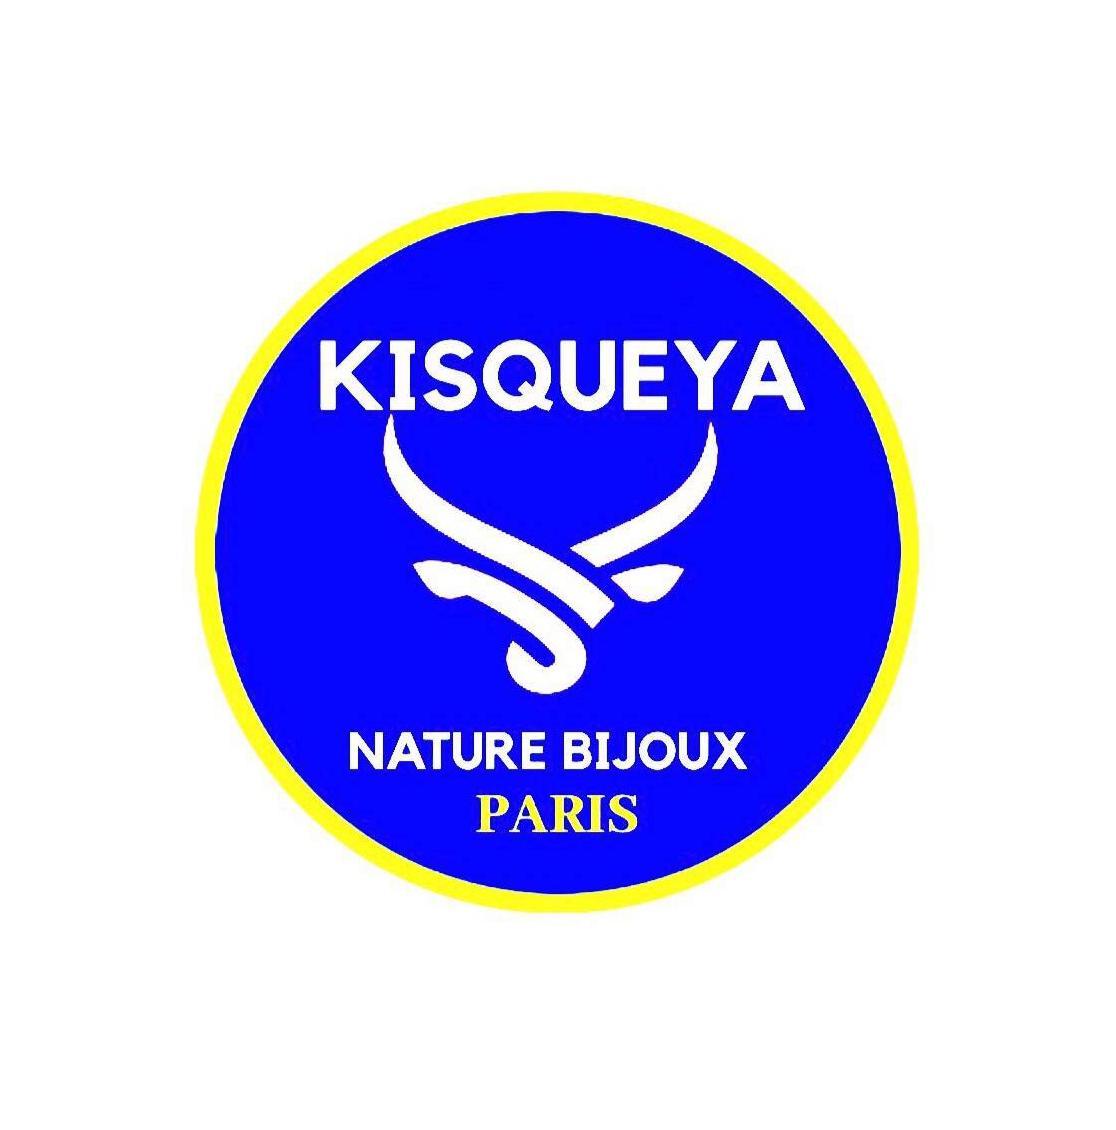 Kisqueya Nature Bijoux